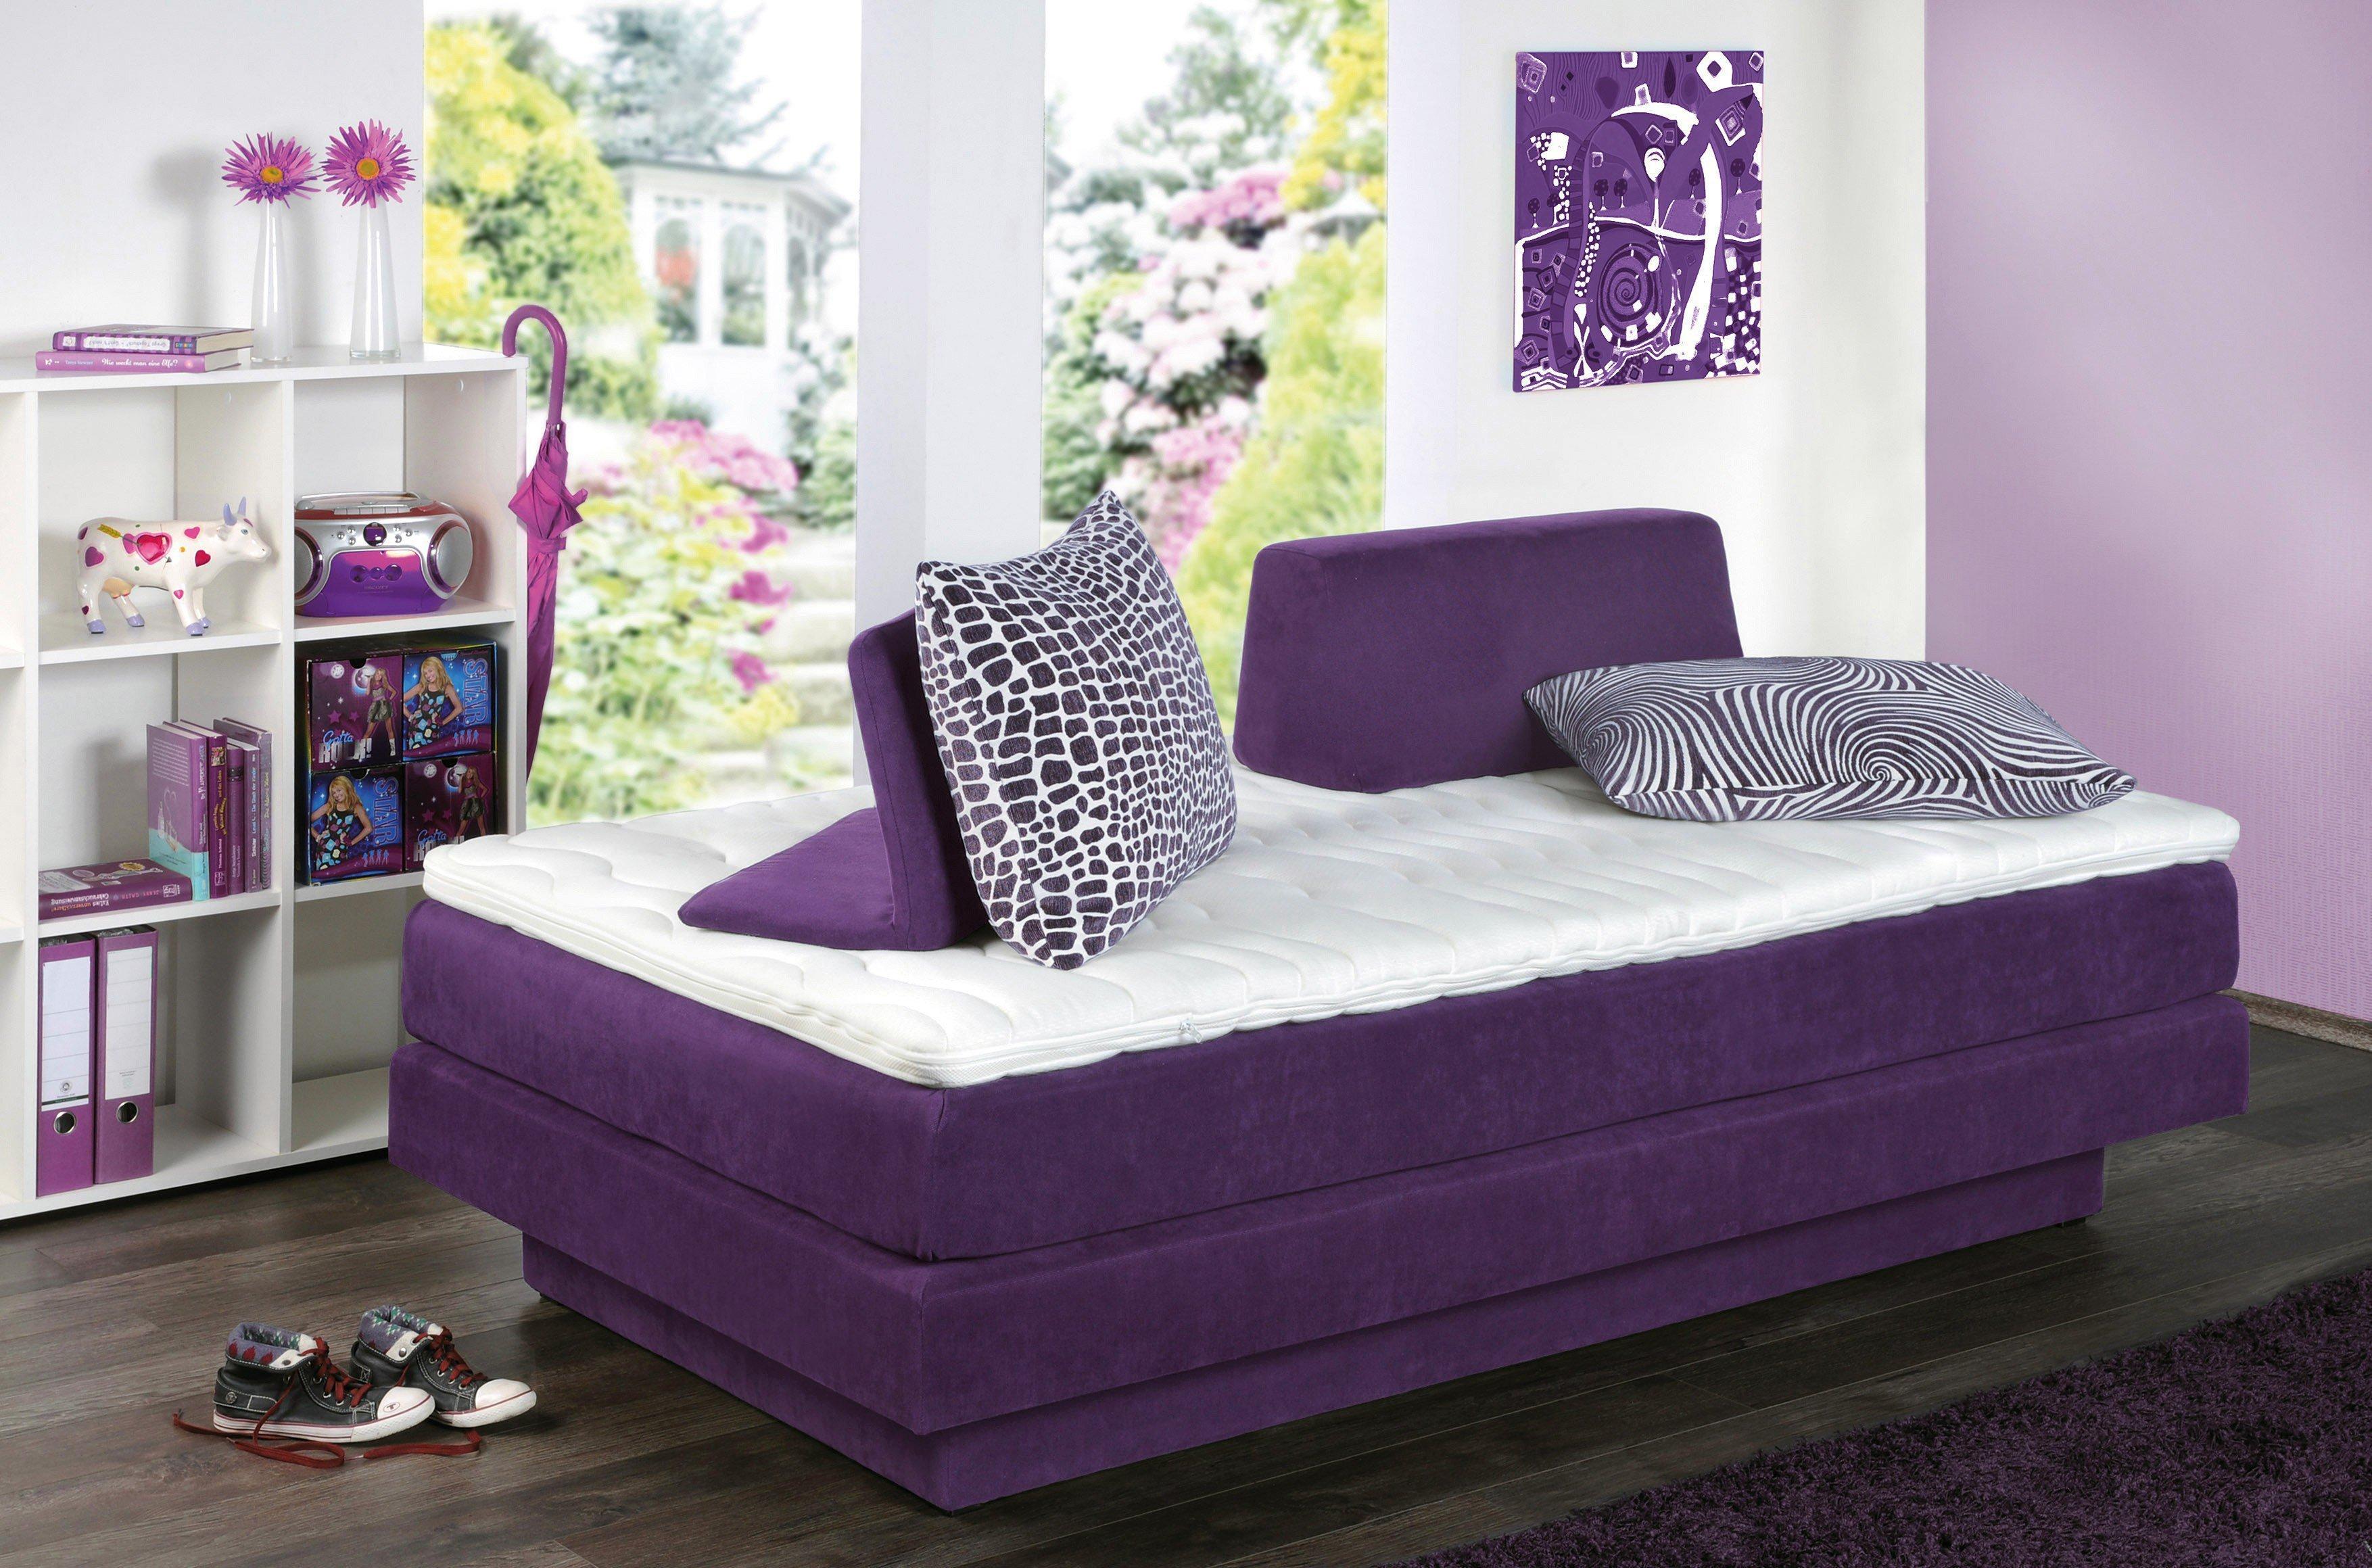 2 tlg baby kinder bettw sche set kinderwagen babywiege. Black Bedroom Furniture Sets. Home Design Ideas